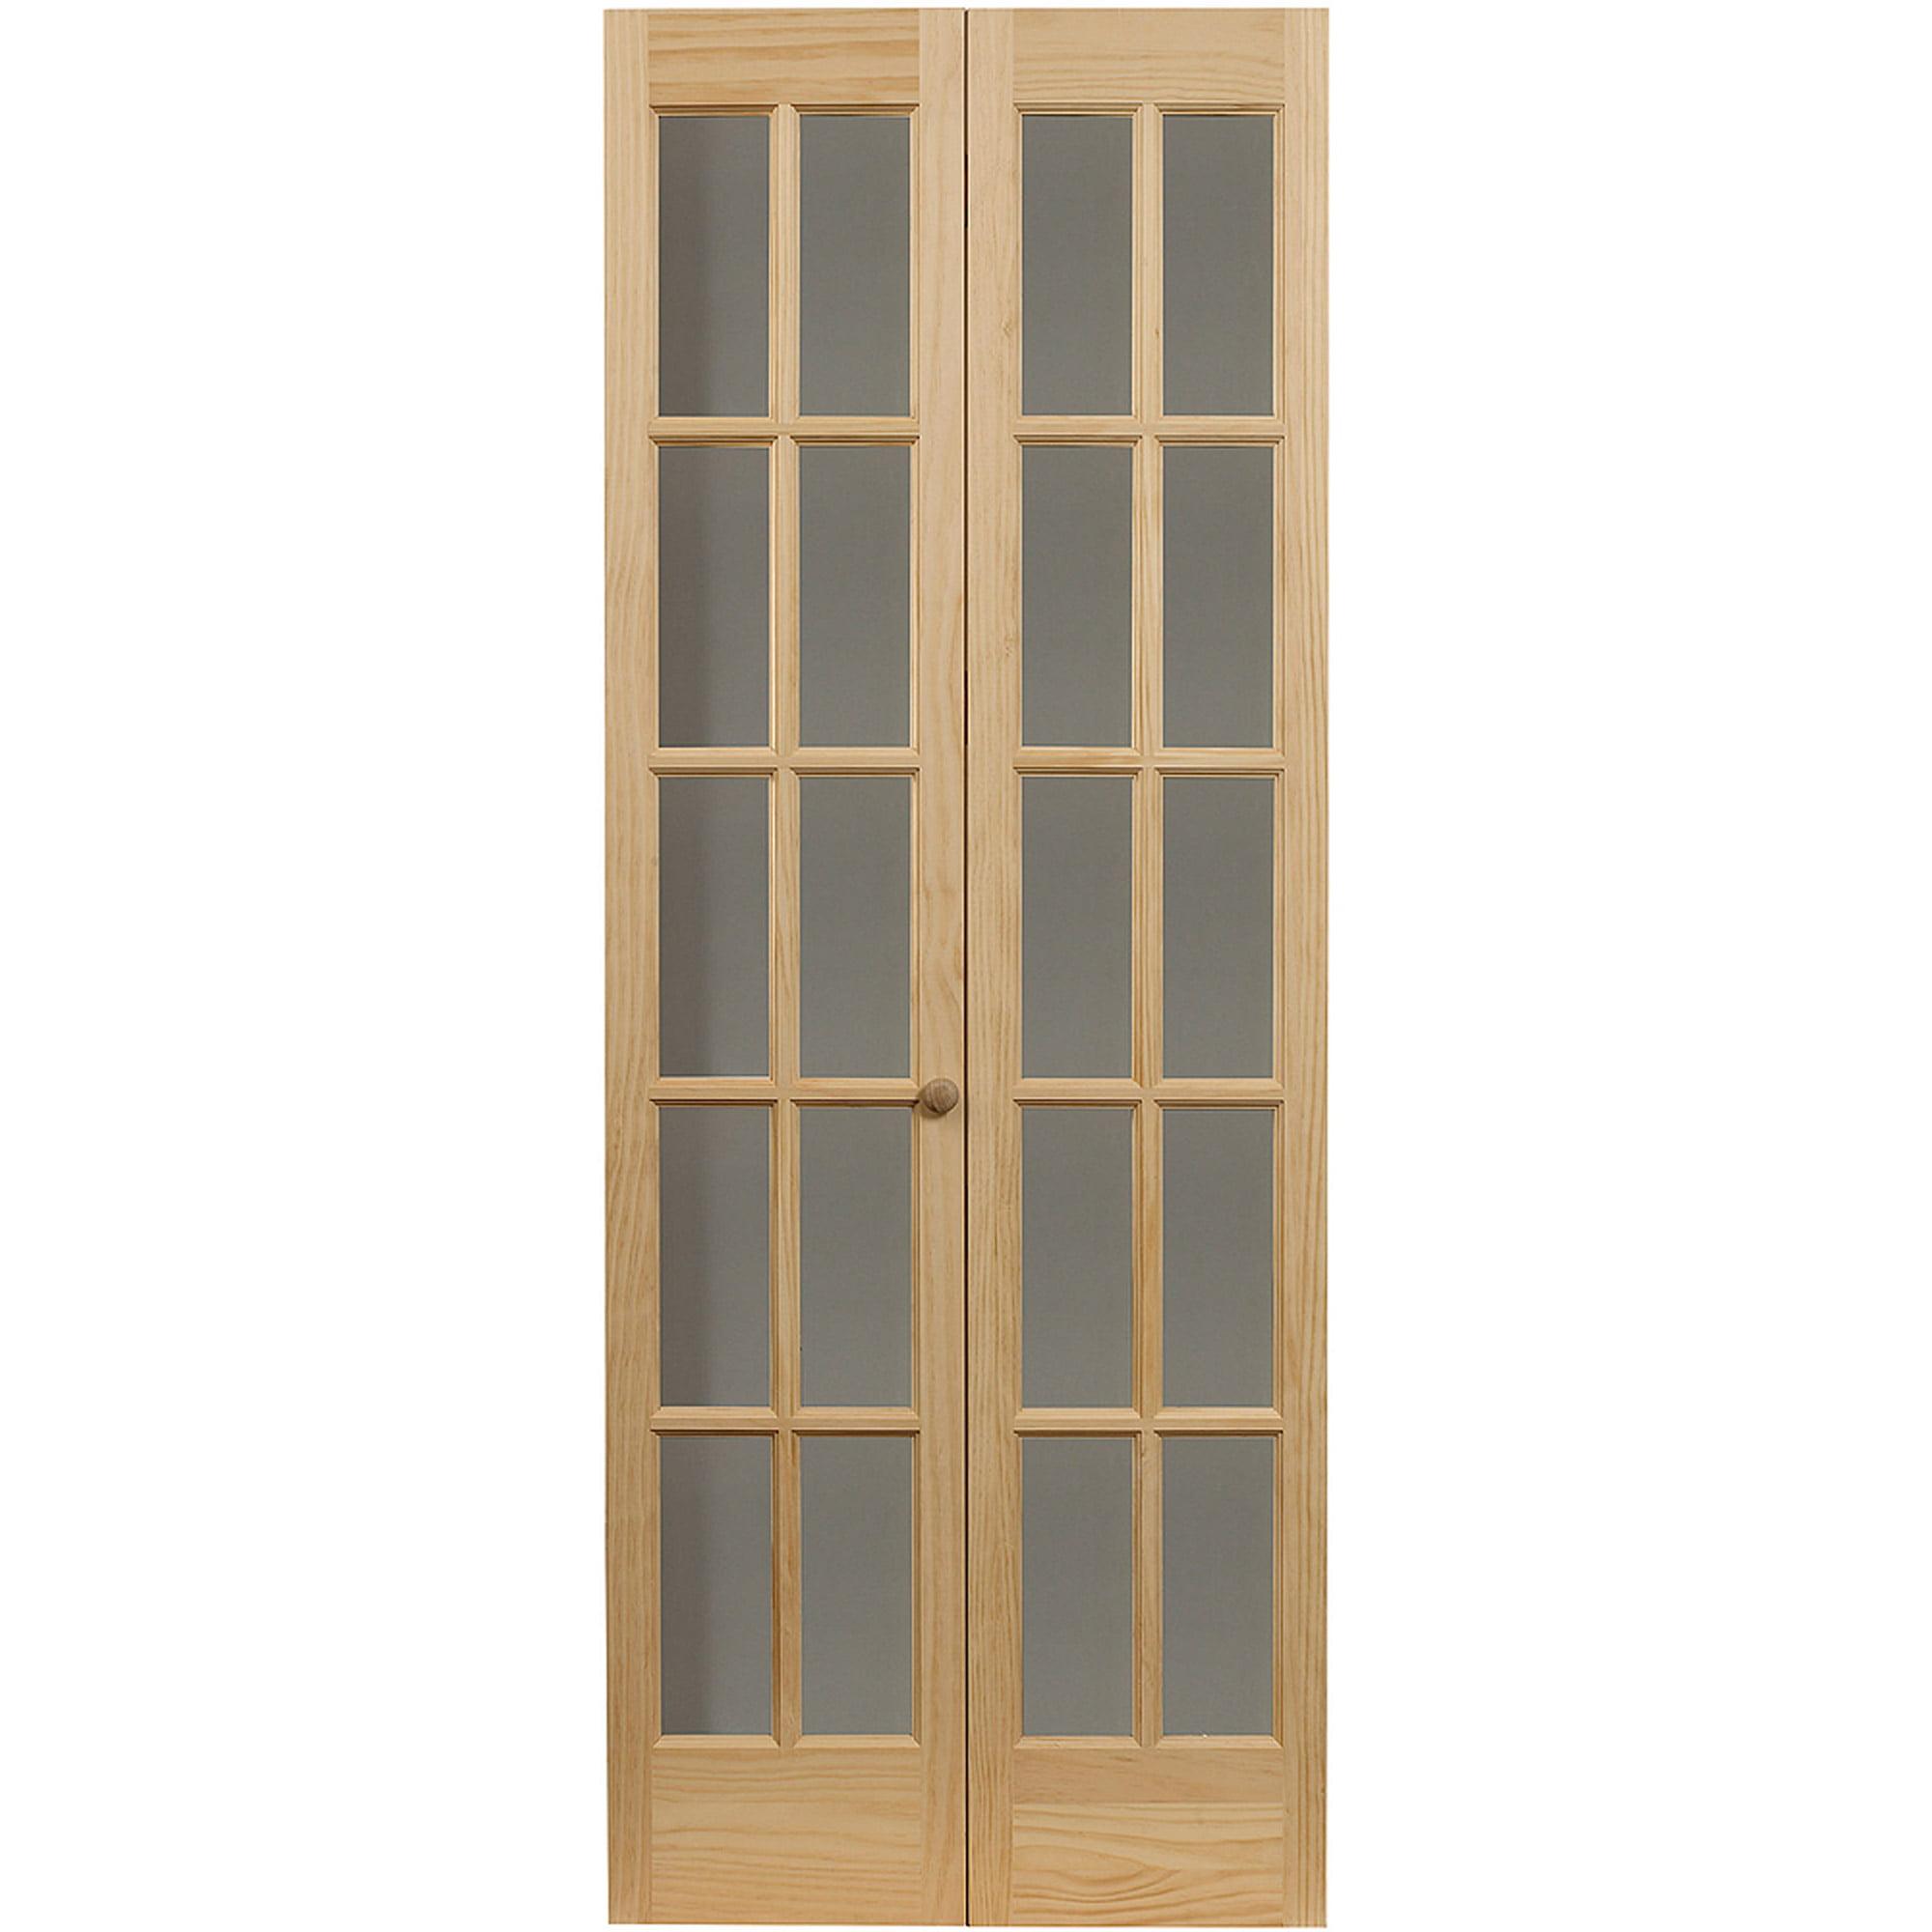 "AWC Traditional Divided Light Glass 32"" x 80.5"" Bifold Door"